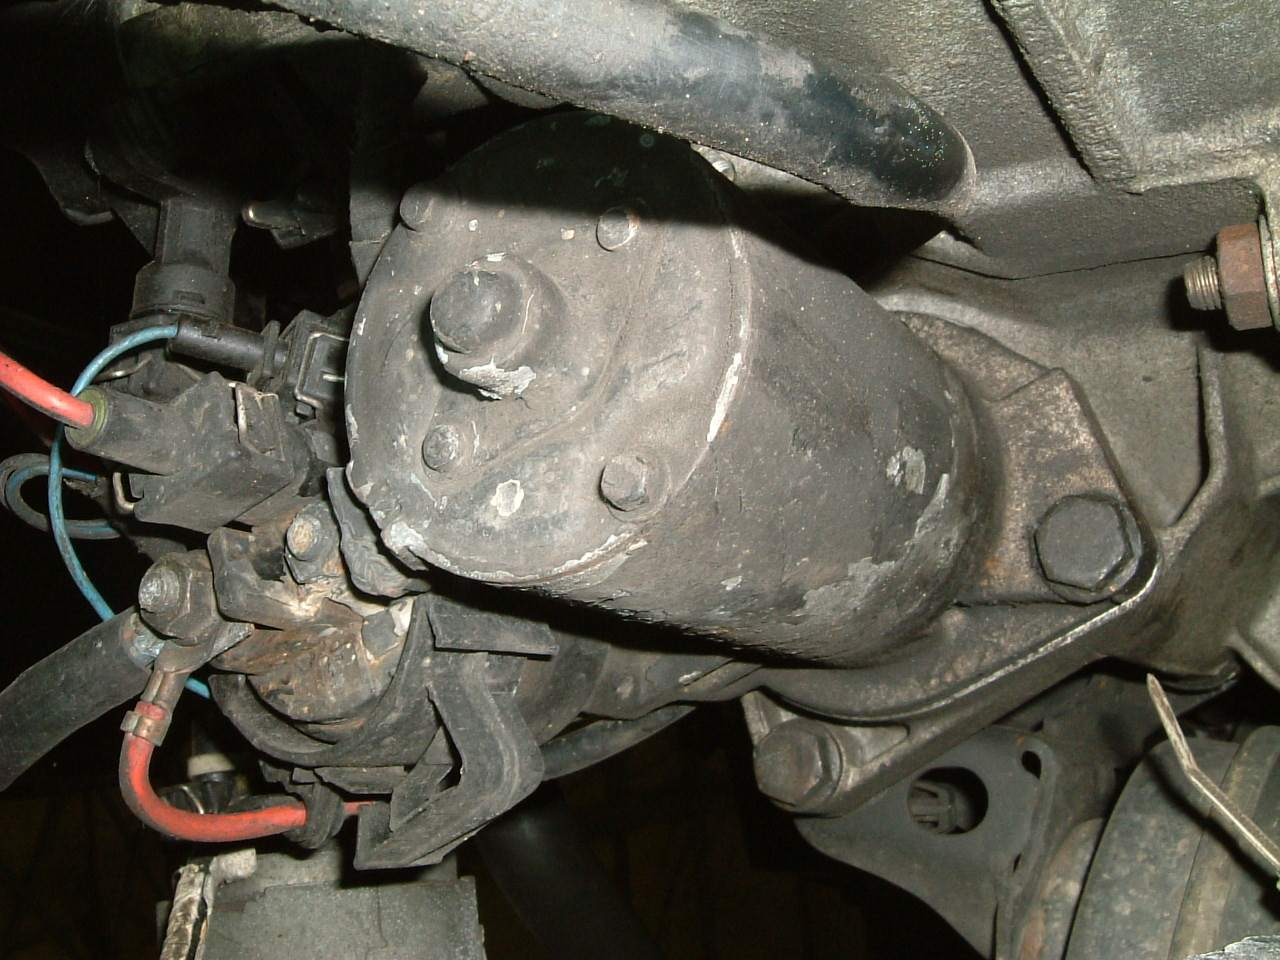 1997 Dodge Stratus 2 4 Liter Engine additionally 2002 Dodge Intrepid 3 5 Timing Belt Marks further Dodge Stratus 2 4 Timing Belt Marks as well Dodge 2500 Rear Disc Brake Conversion besides 2004 Jeep Liberty Timing Chain. on chrysler 2 4 timing belt tensioner